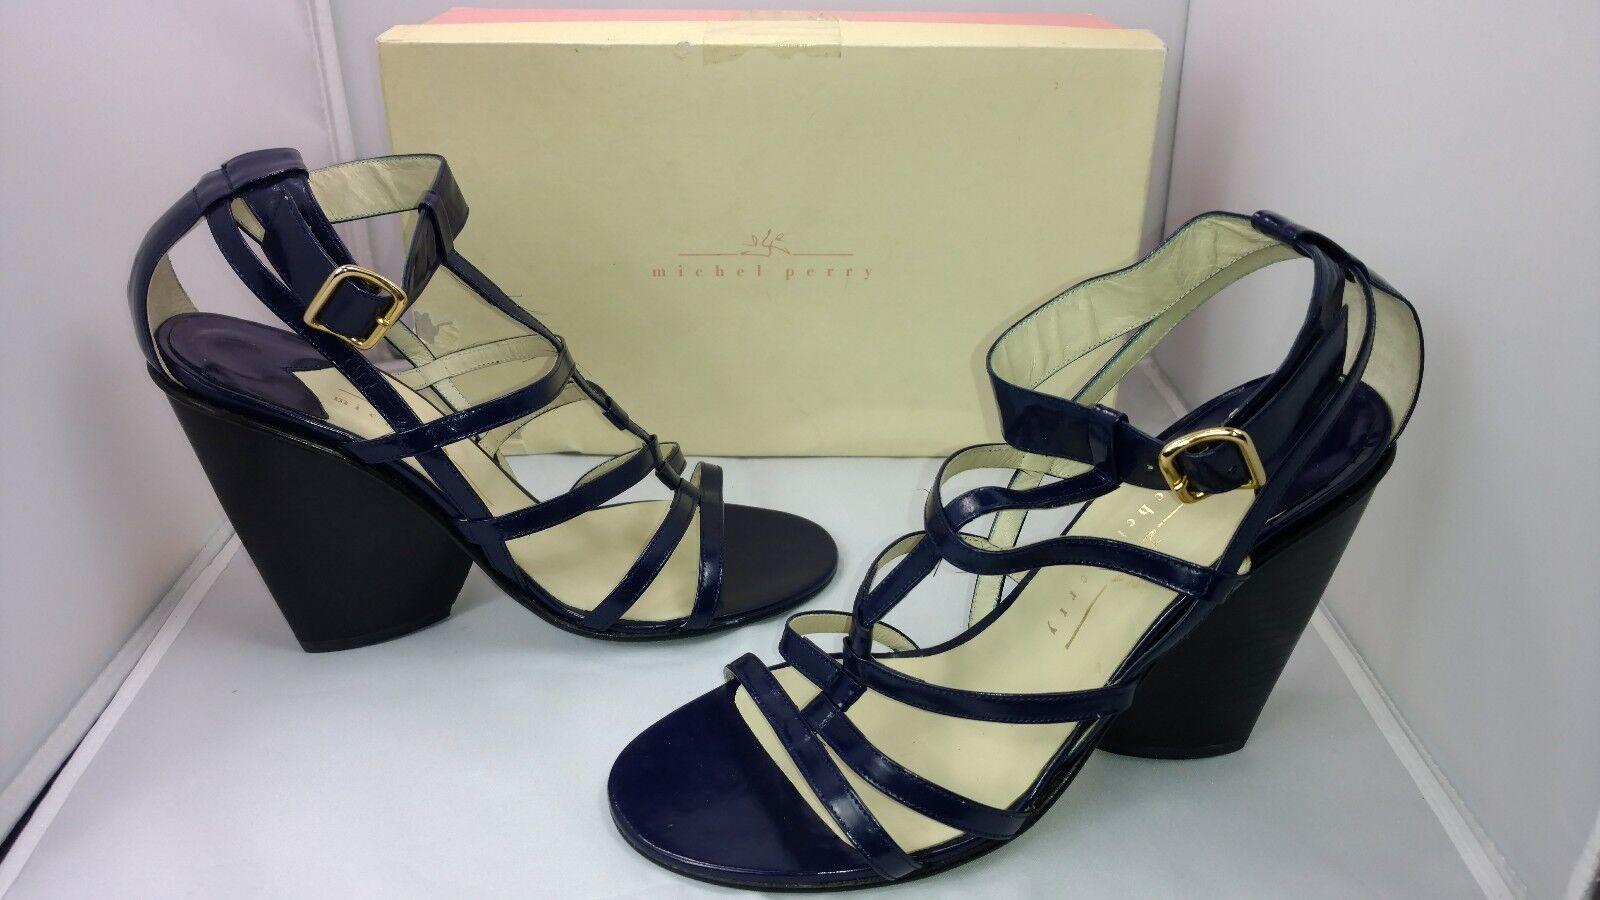 Designer Michel Perry bluee Leather Strap Sandals Wedge Heels  Women's 39